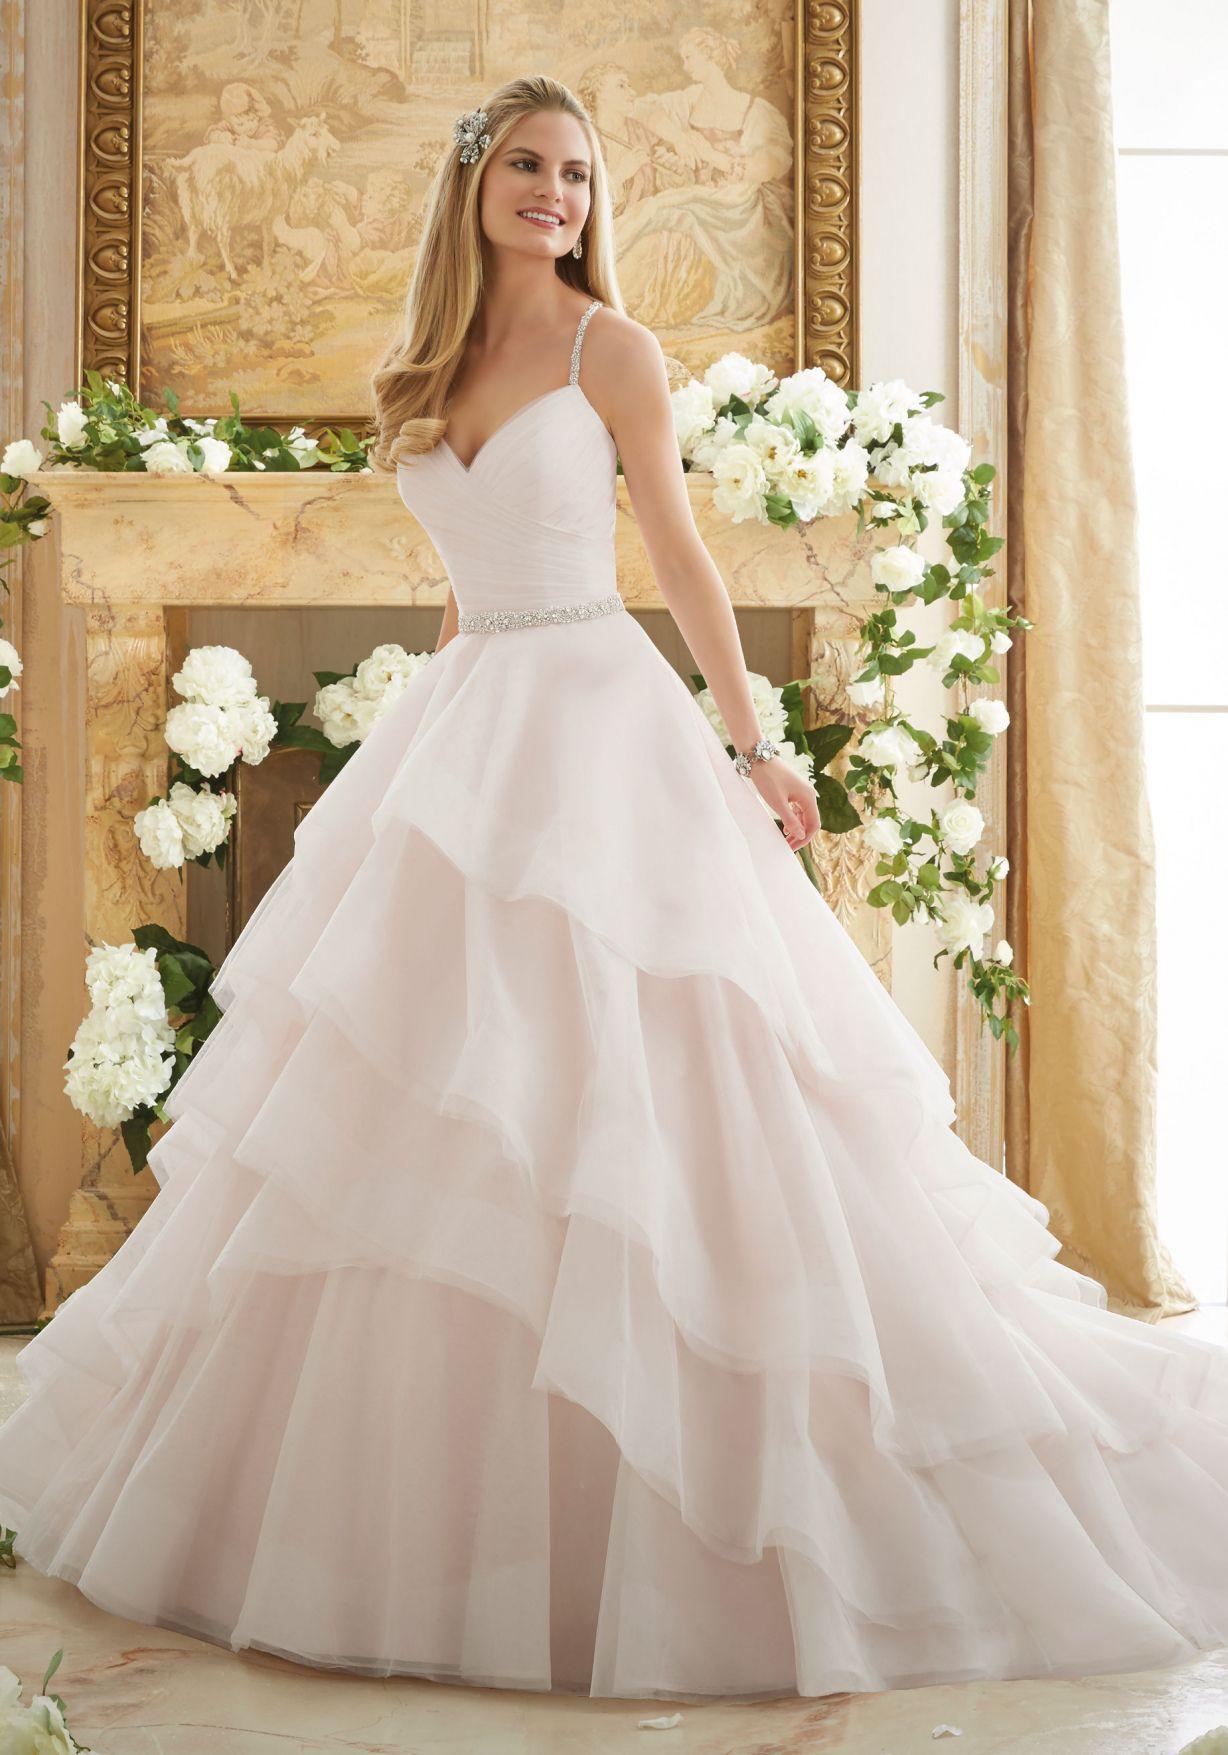 2018 Tulle Ball Gown Wedding Dress - Best Shapewear for Wedding ...